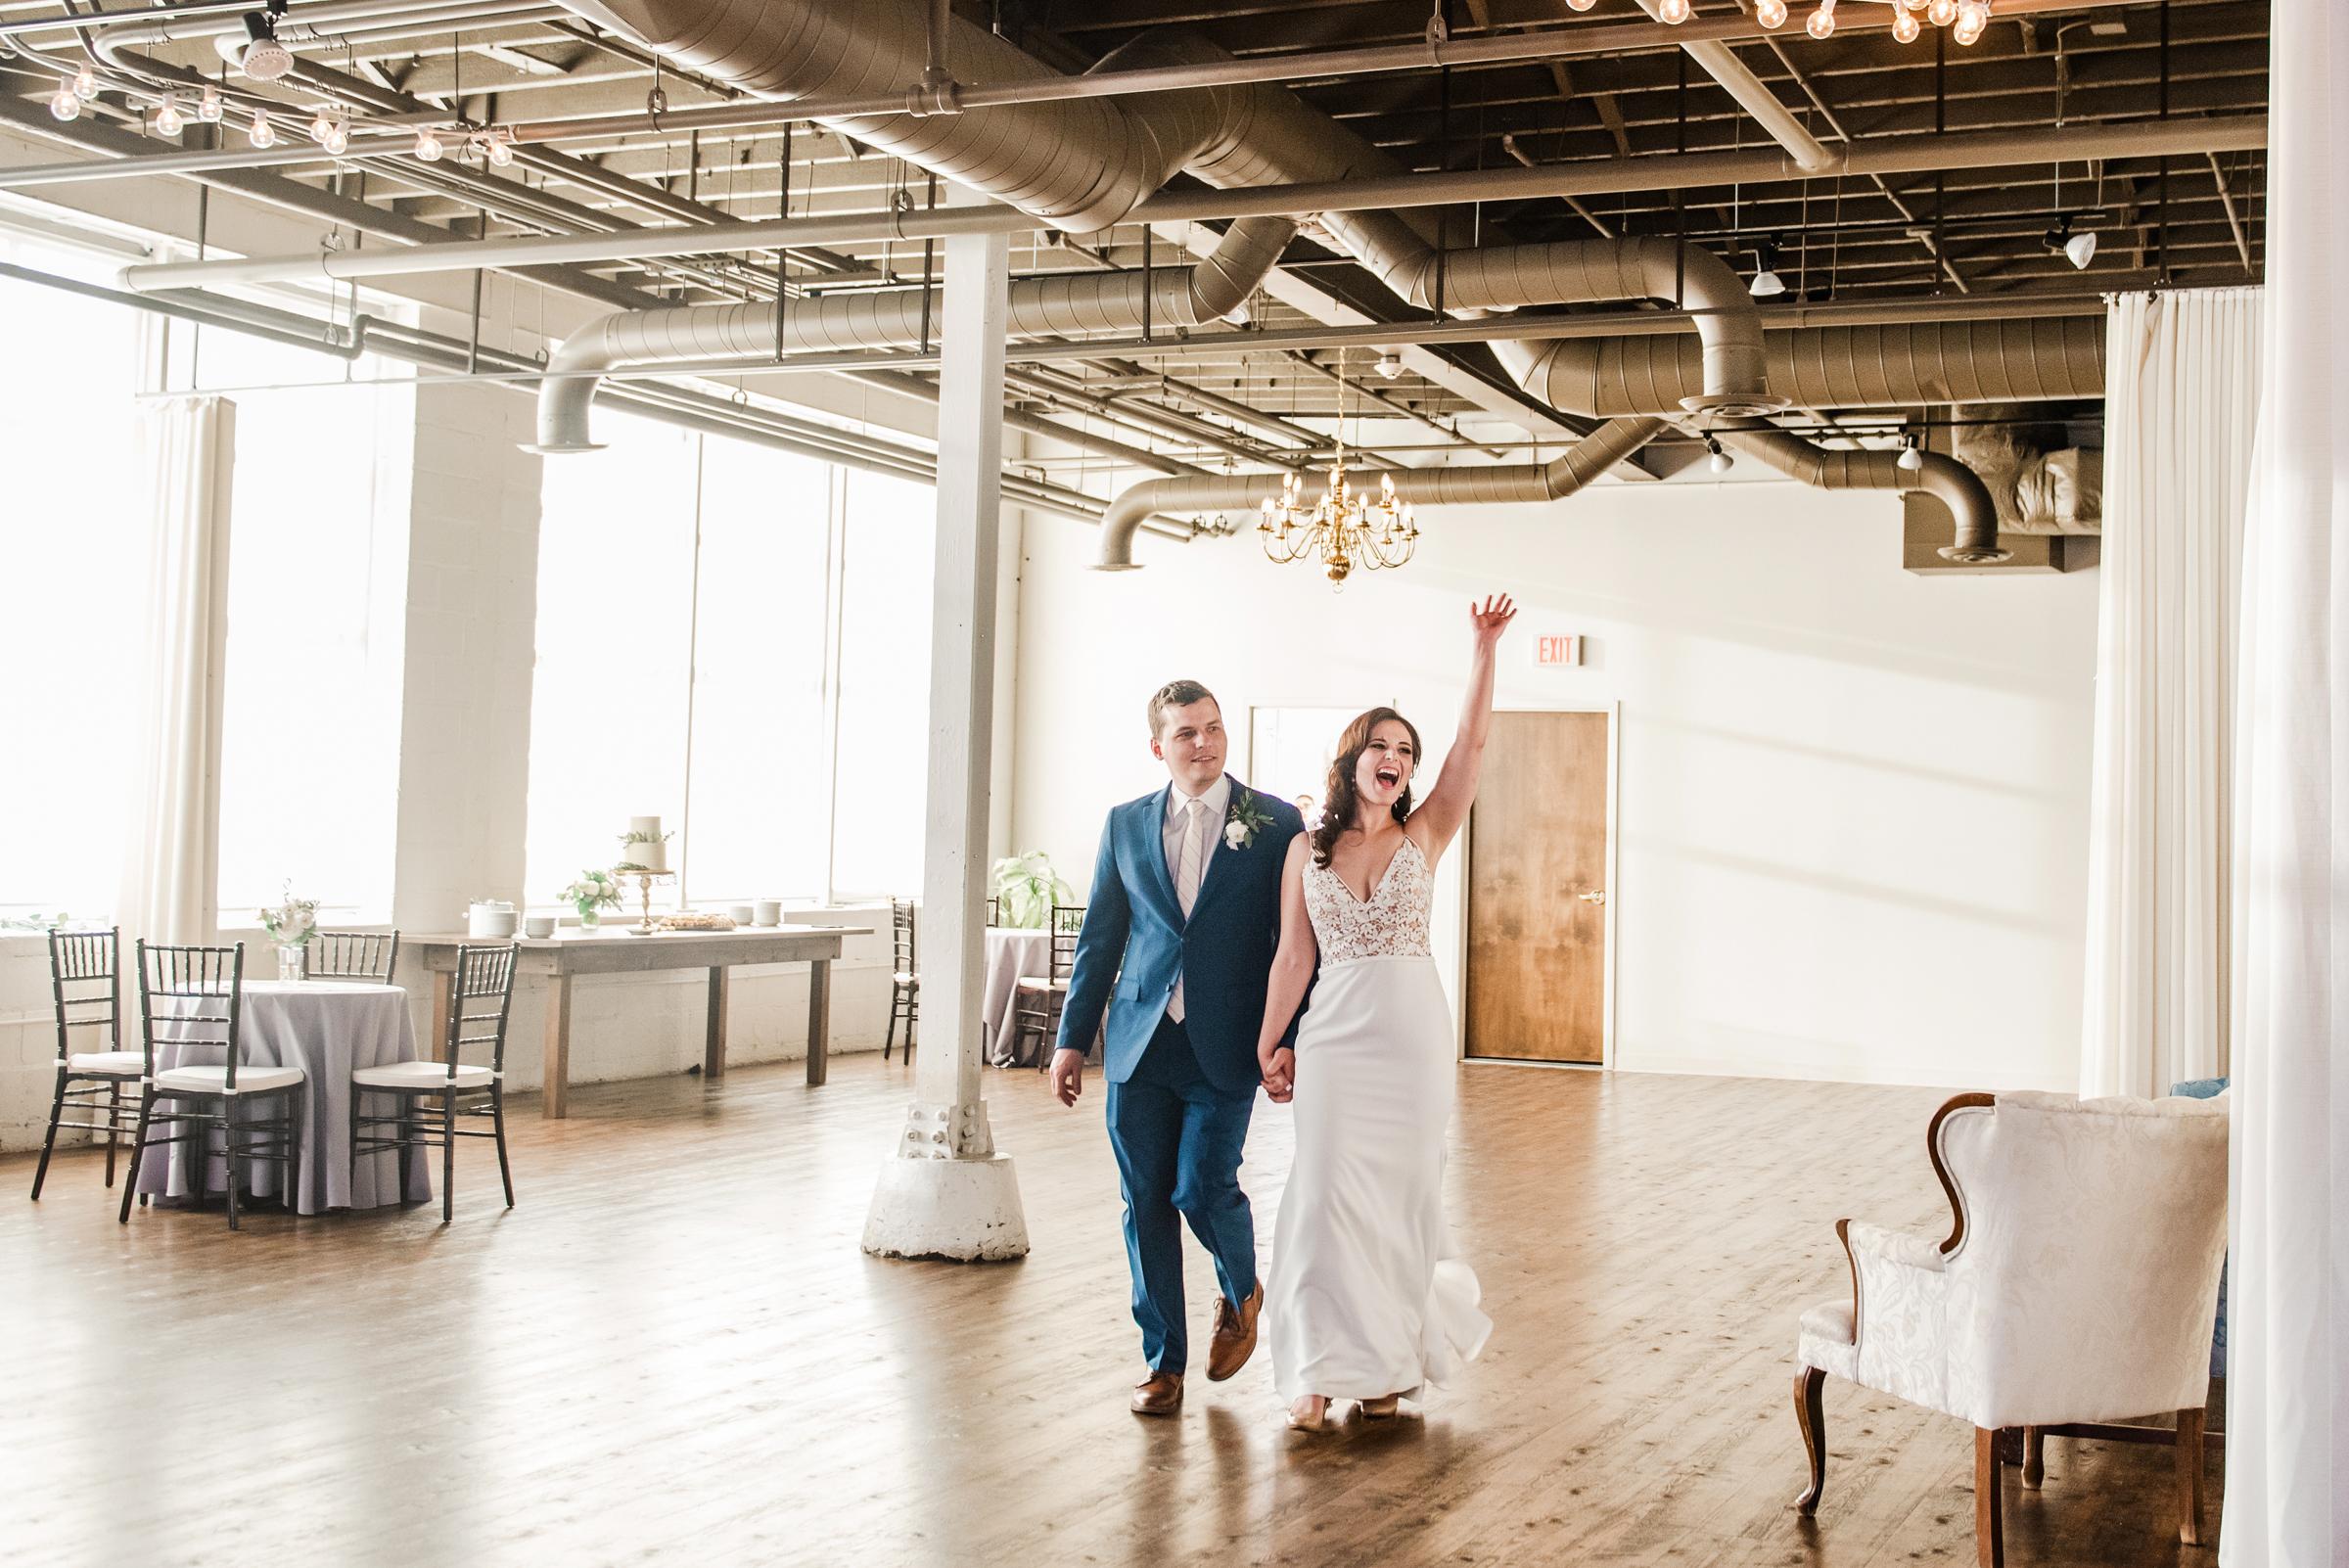 The_Arbor_LoftRochester_Wedding_JILL_STUDIO_Rochester_NY_Photographer_185135.jpg